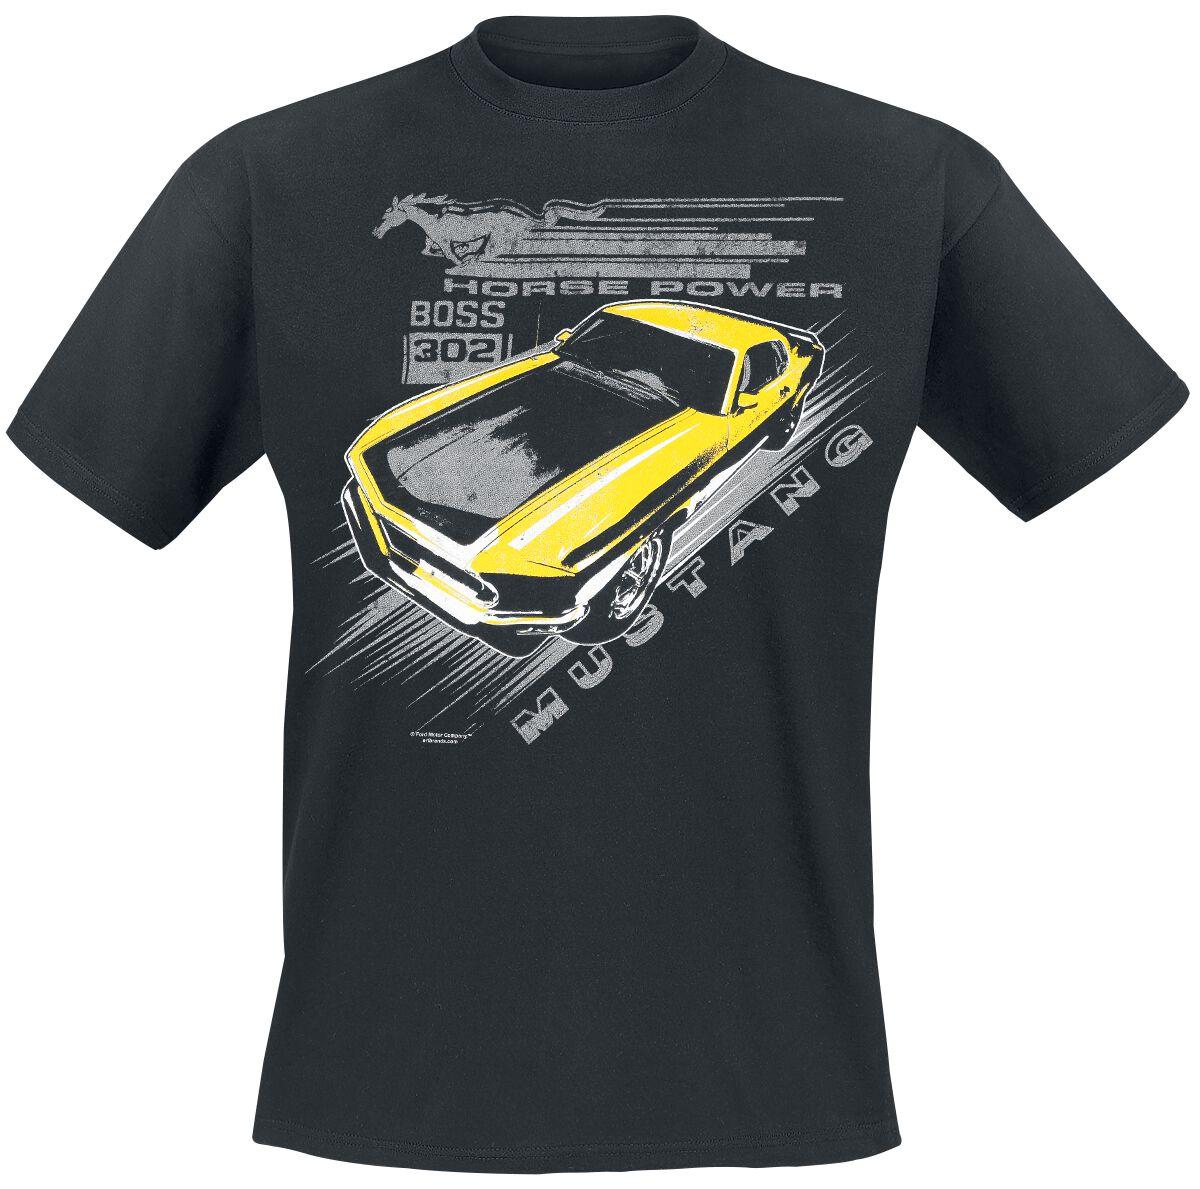 Merch dla Fanów - Koszulki - T-Shirt Ford Mustang Vintage Yellow Boss T-Shirt czarny - 357086